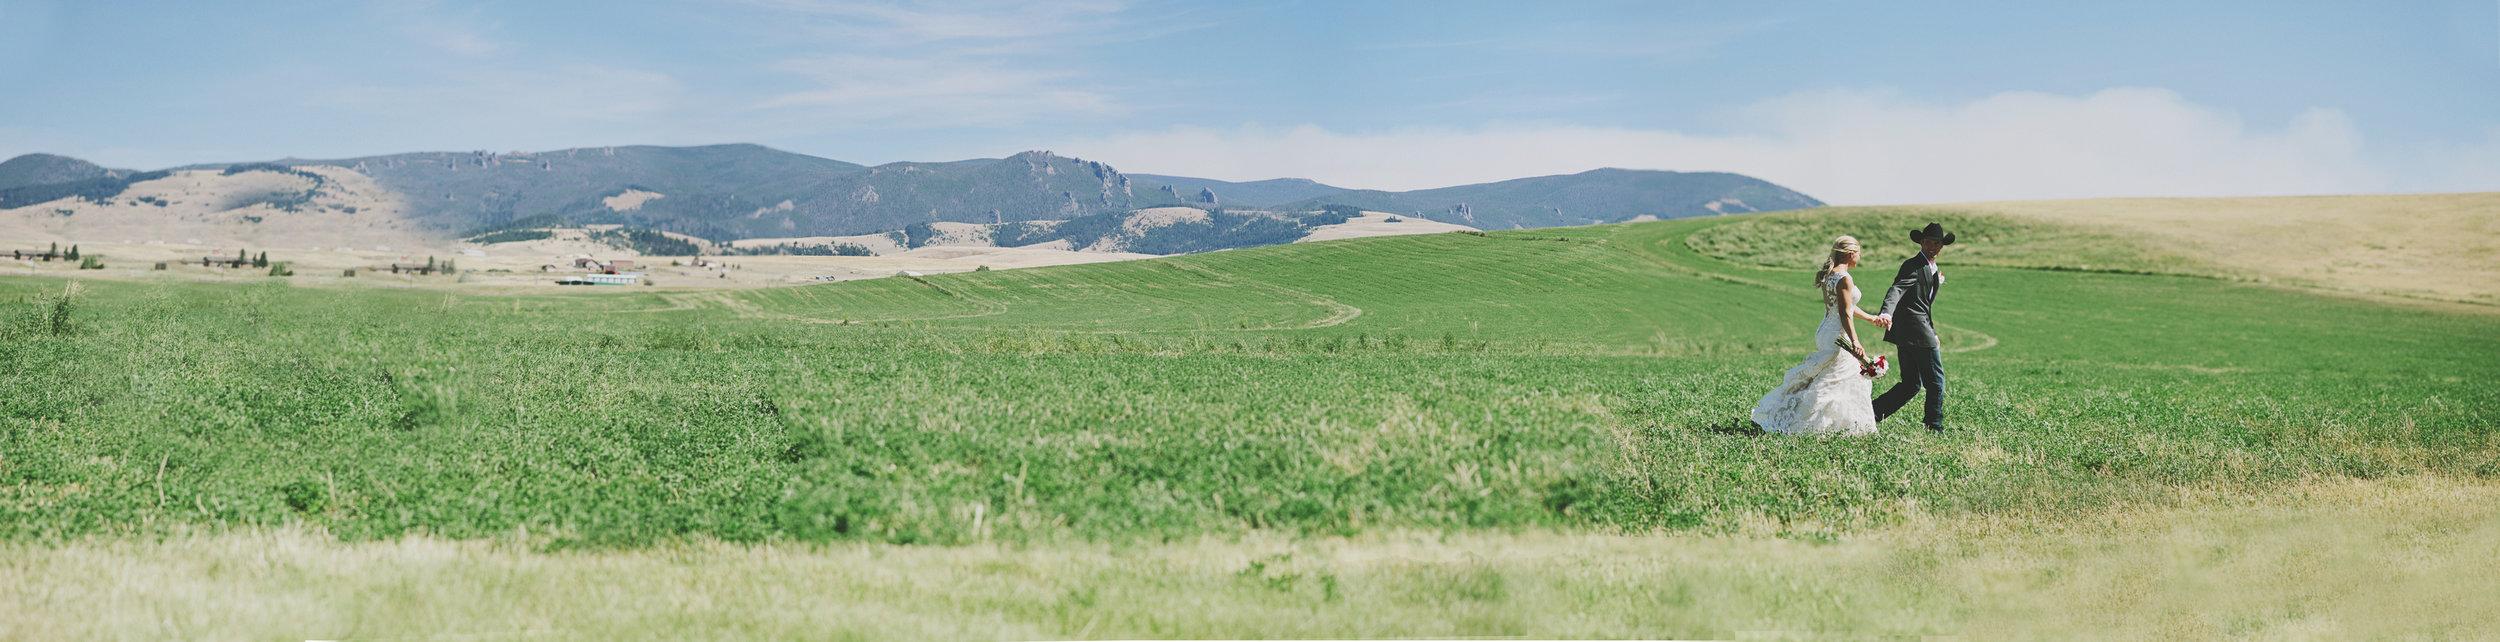 Panorama in Field.jpg